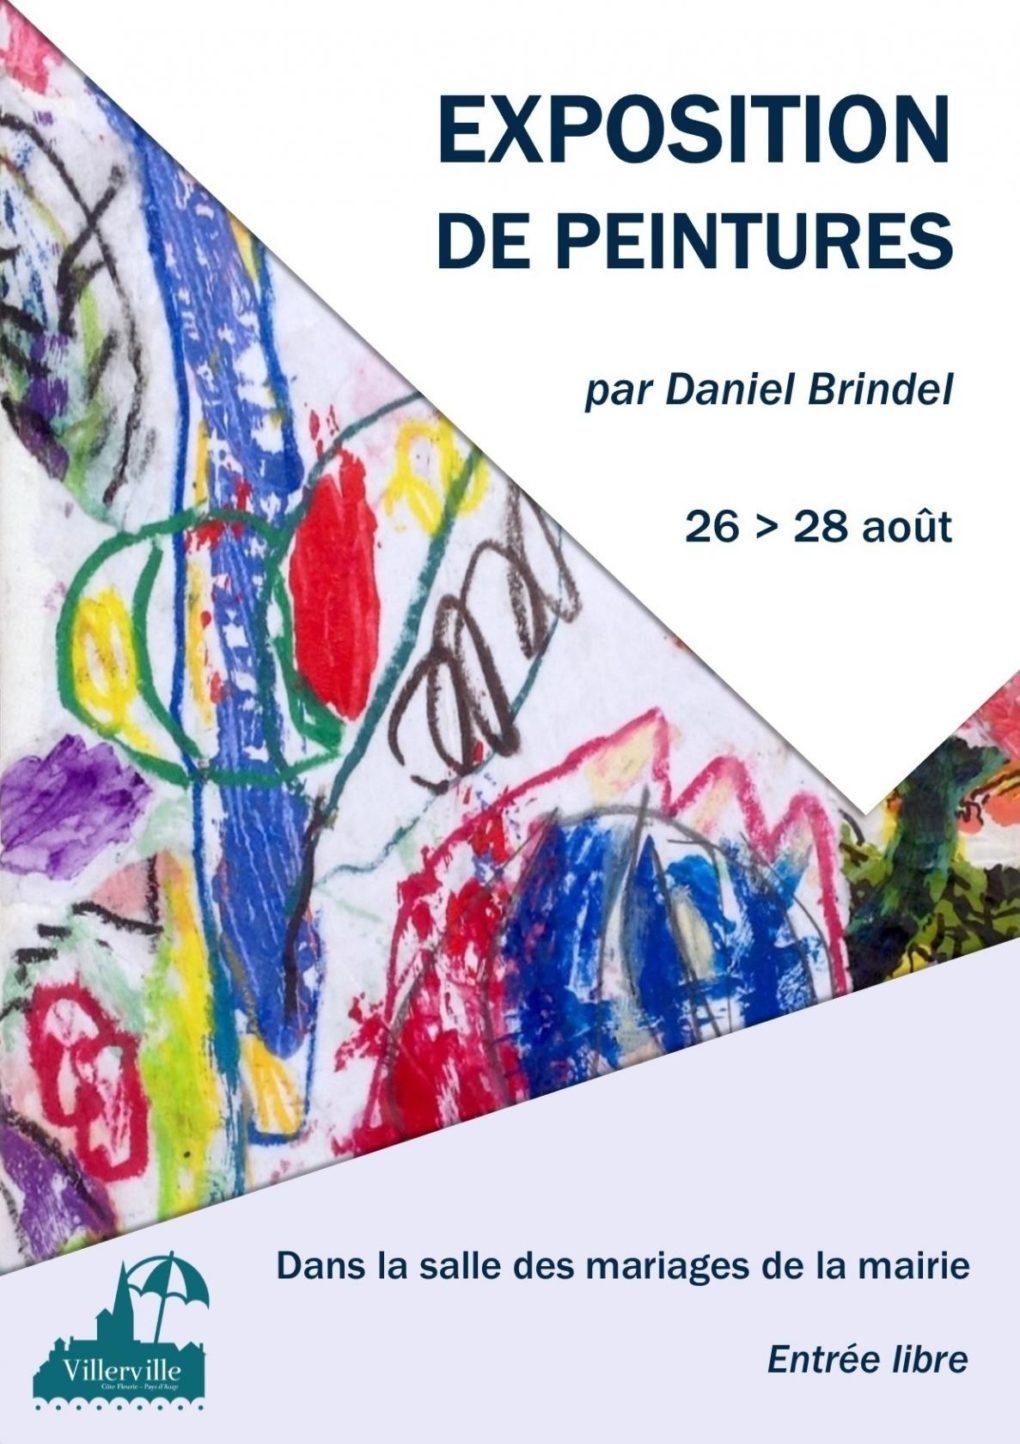 Exposition de peintures par Daniel Brindel Villerville